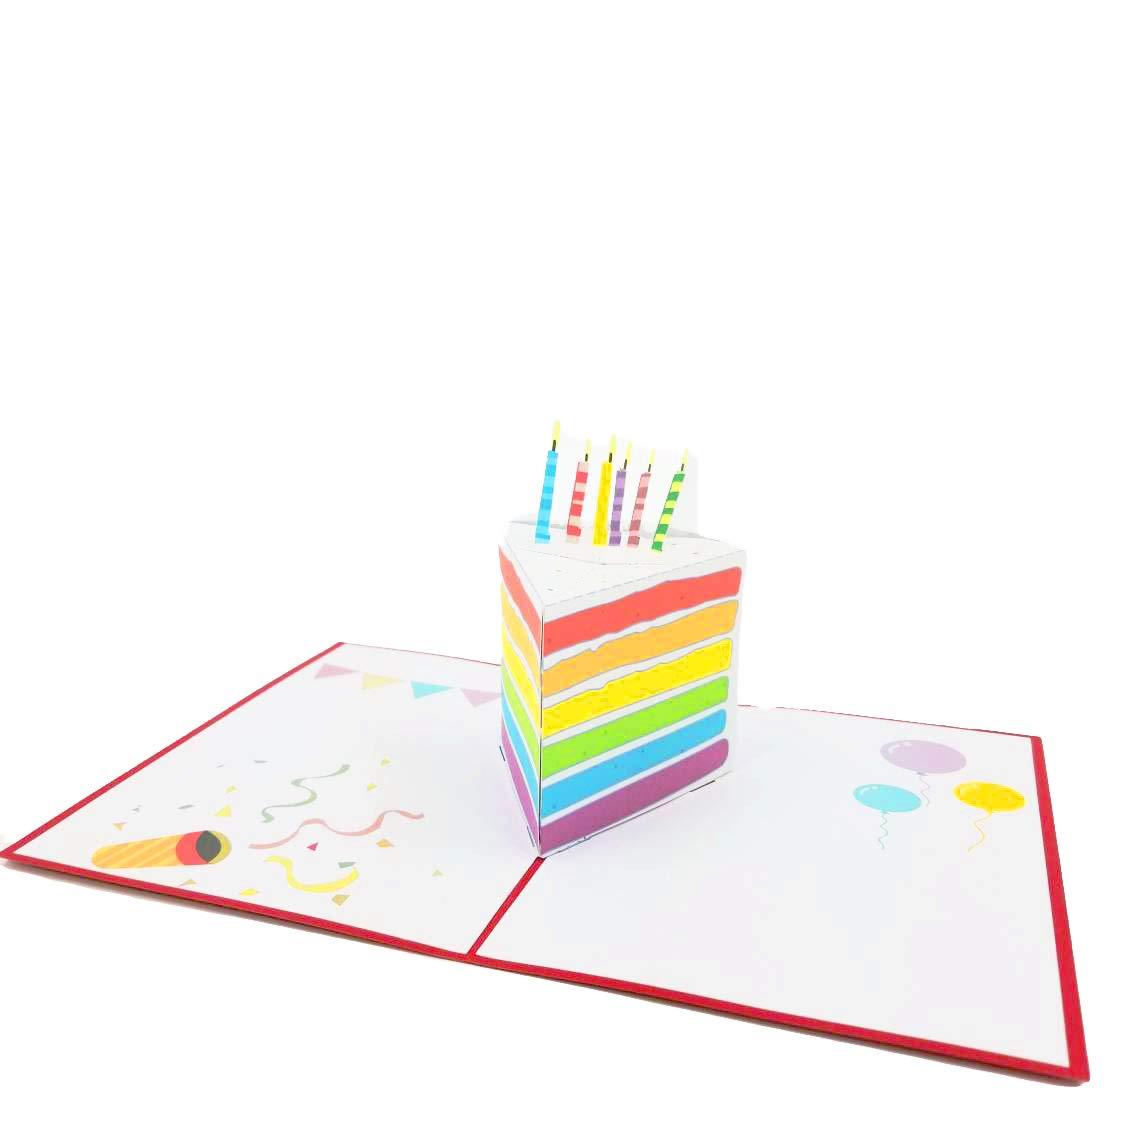 3D 生日蛋糕弹出式贺卡 - 快乐生日卡,蛋糕弹出式生日卡,父亲节,母亲节,庆祝,祝,祝  流行卡片快递